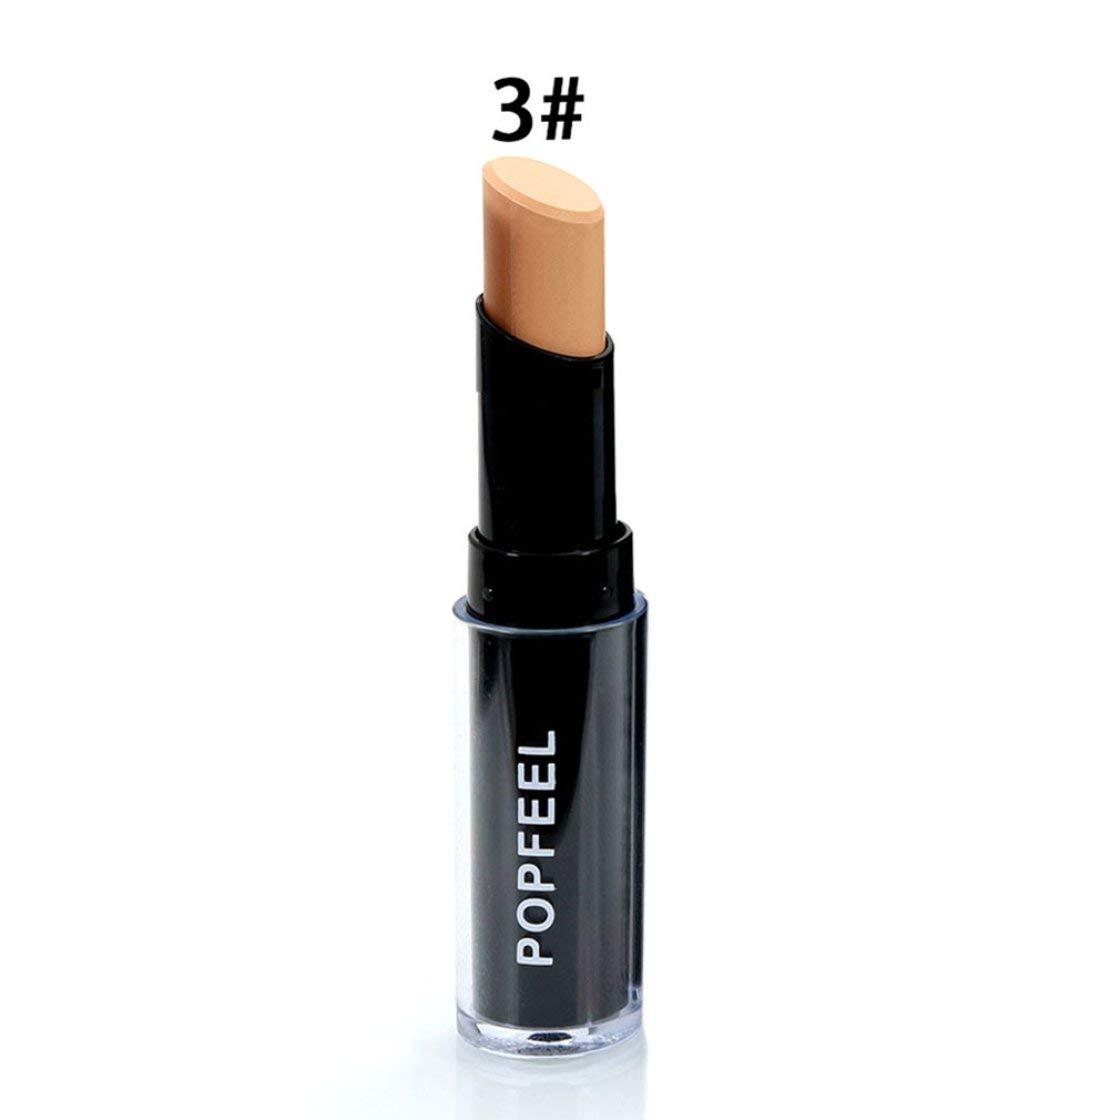 POPFEEL Profesión Belleza Cubierta completa Peca Corrector de acné Stick Pen Facial Makup Hidratante Lápiz Laurelmartina